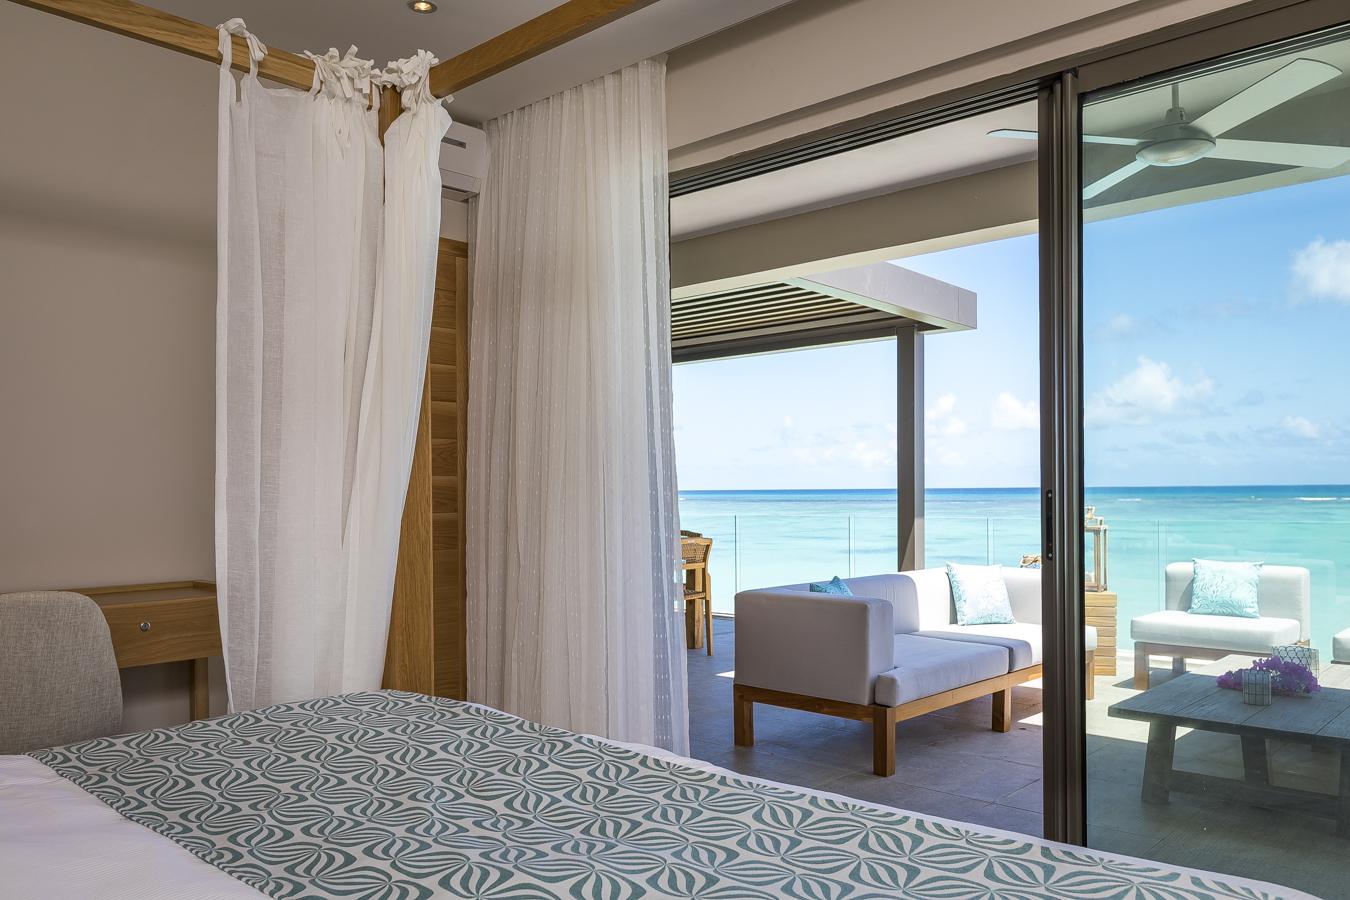 KotNor bedroom 2 with sea view